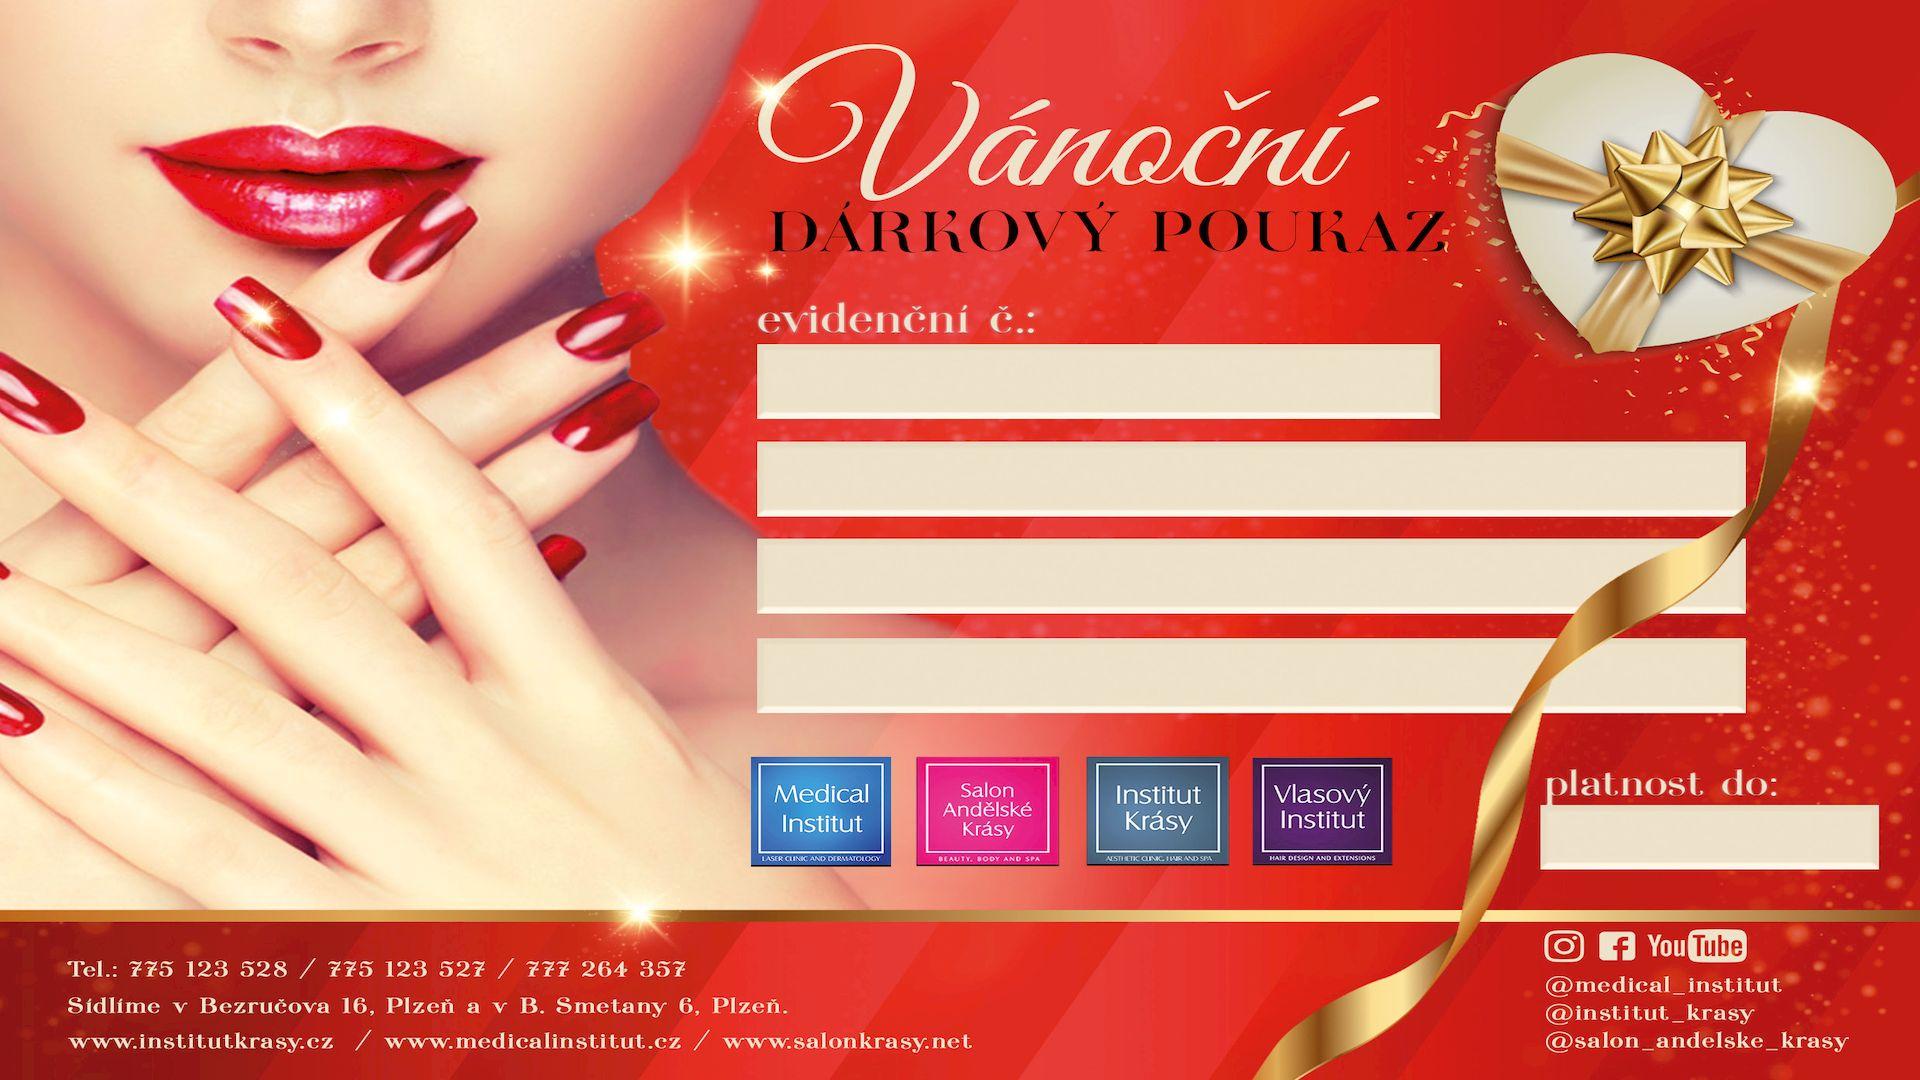 Vanocni Darkove Poukazy Vhodny Vanocni Darek Marketing Info Plzen